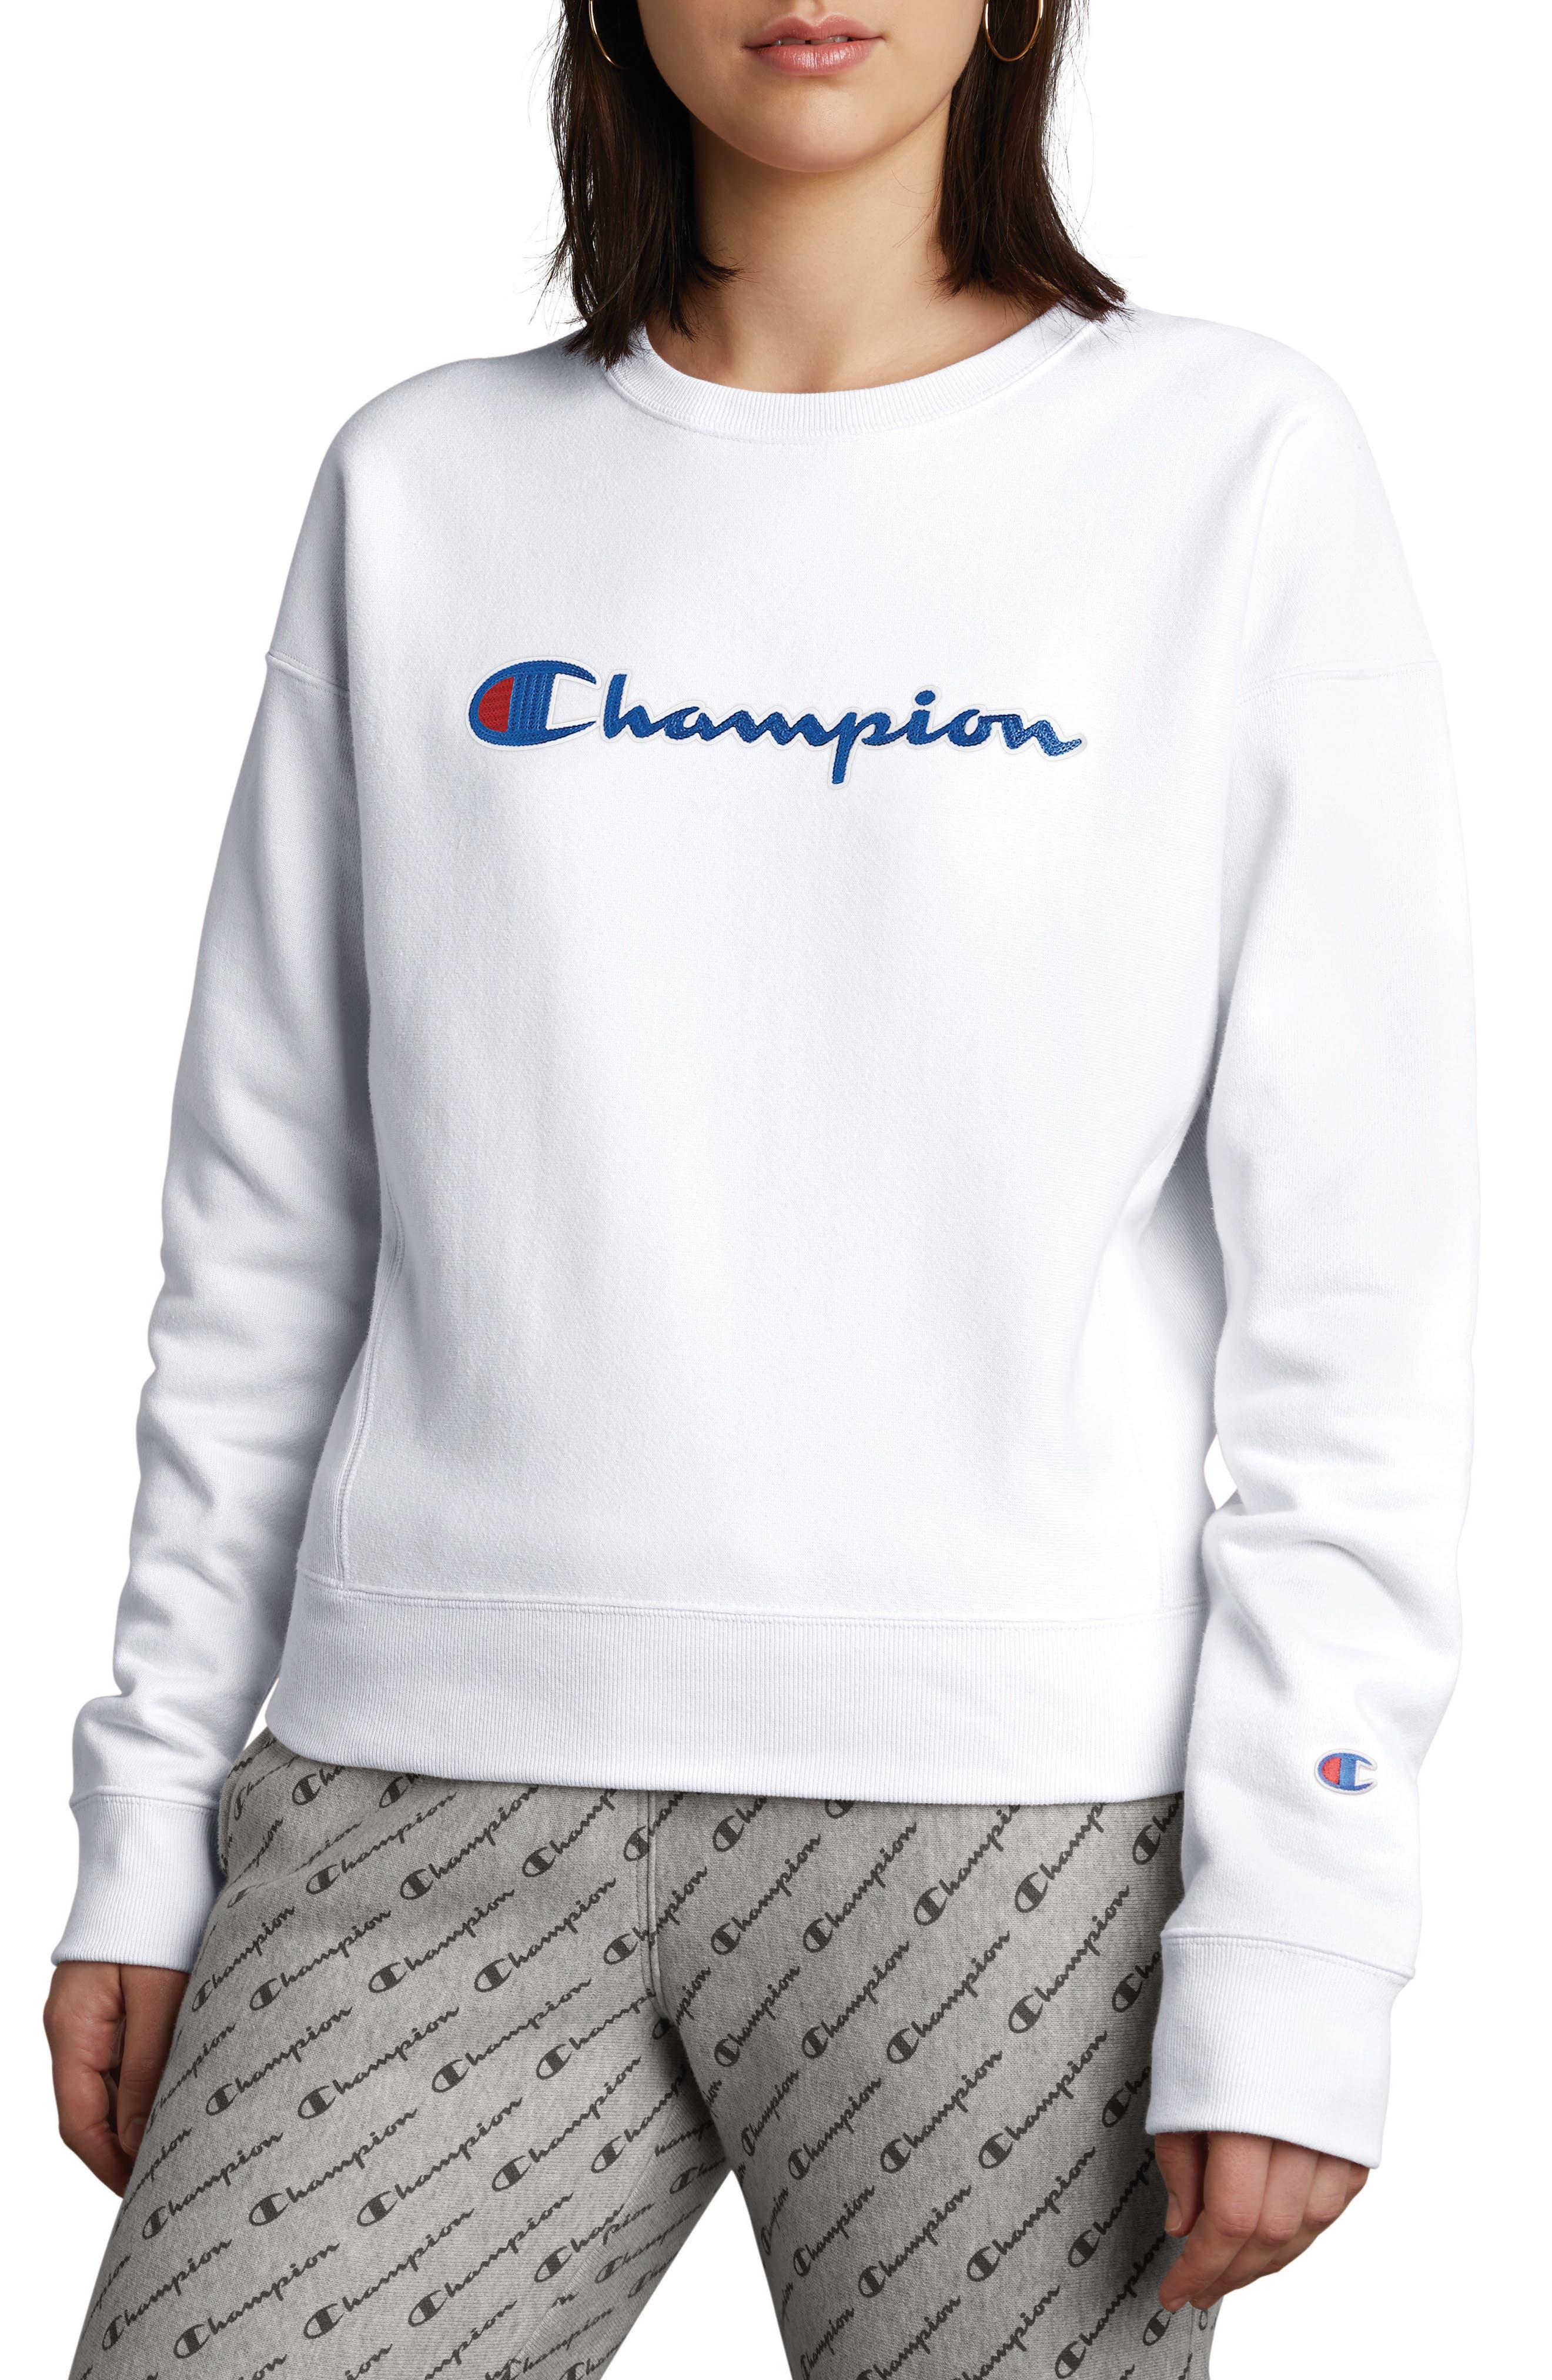 HoodiesNordstrom Champion Sweatshirtsamp; Champion Sweatshirtsamp; Champion Sweatshirtsamp; HoodiesNordstrom Women's Women's Women's HoodiesNordstrom Women's DeWH2YIE9b